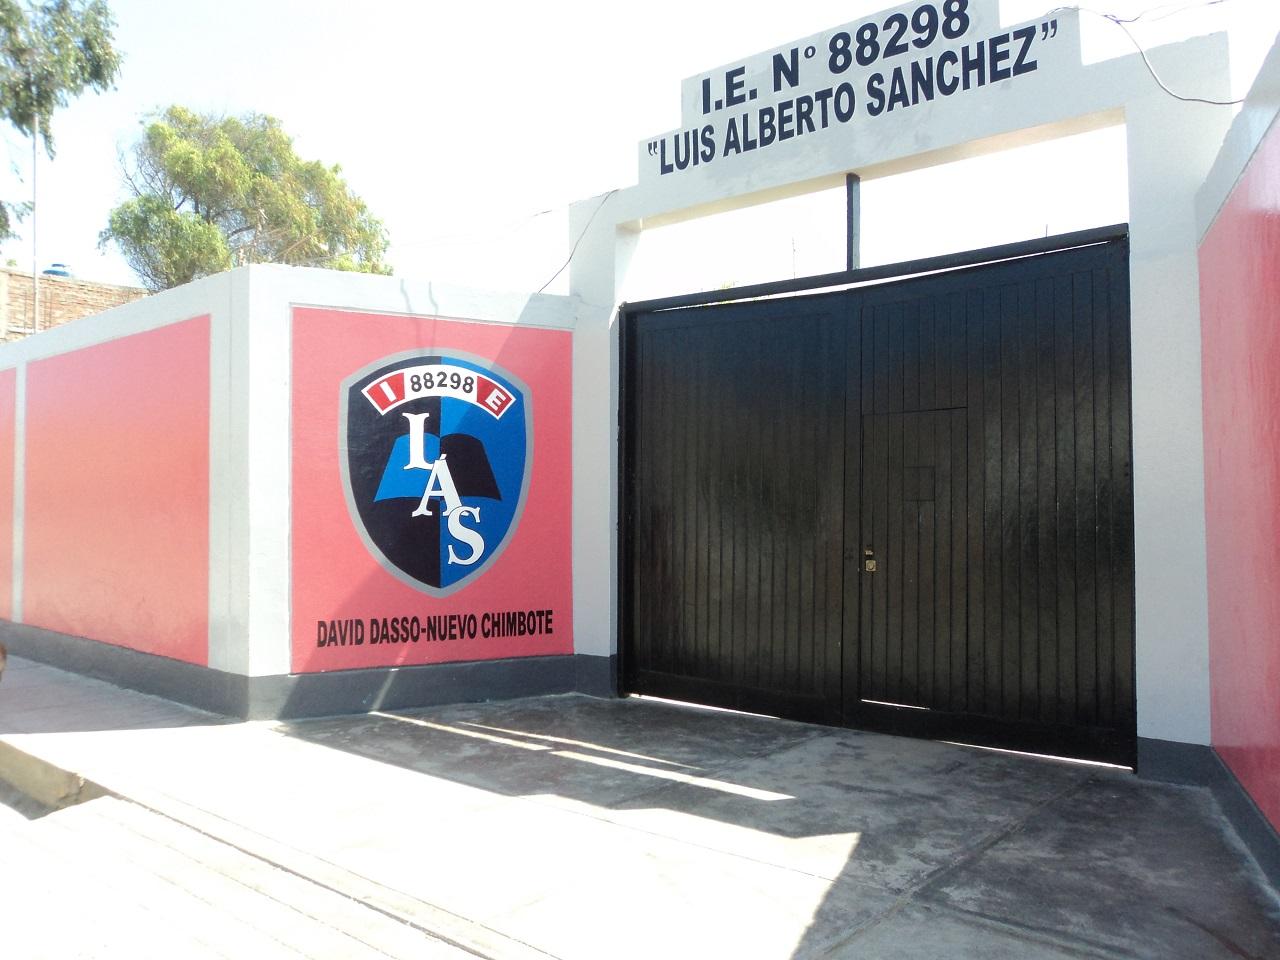 Colegio 88298 LUIS ALBERTO SANCHEZ - Nuevo Chimbote